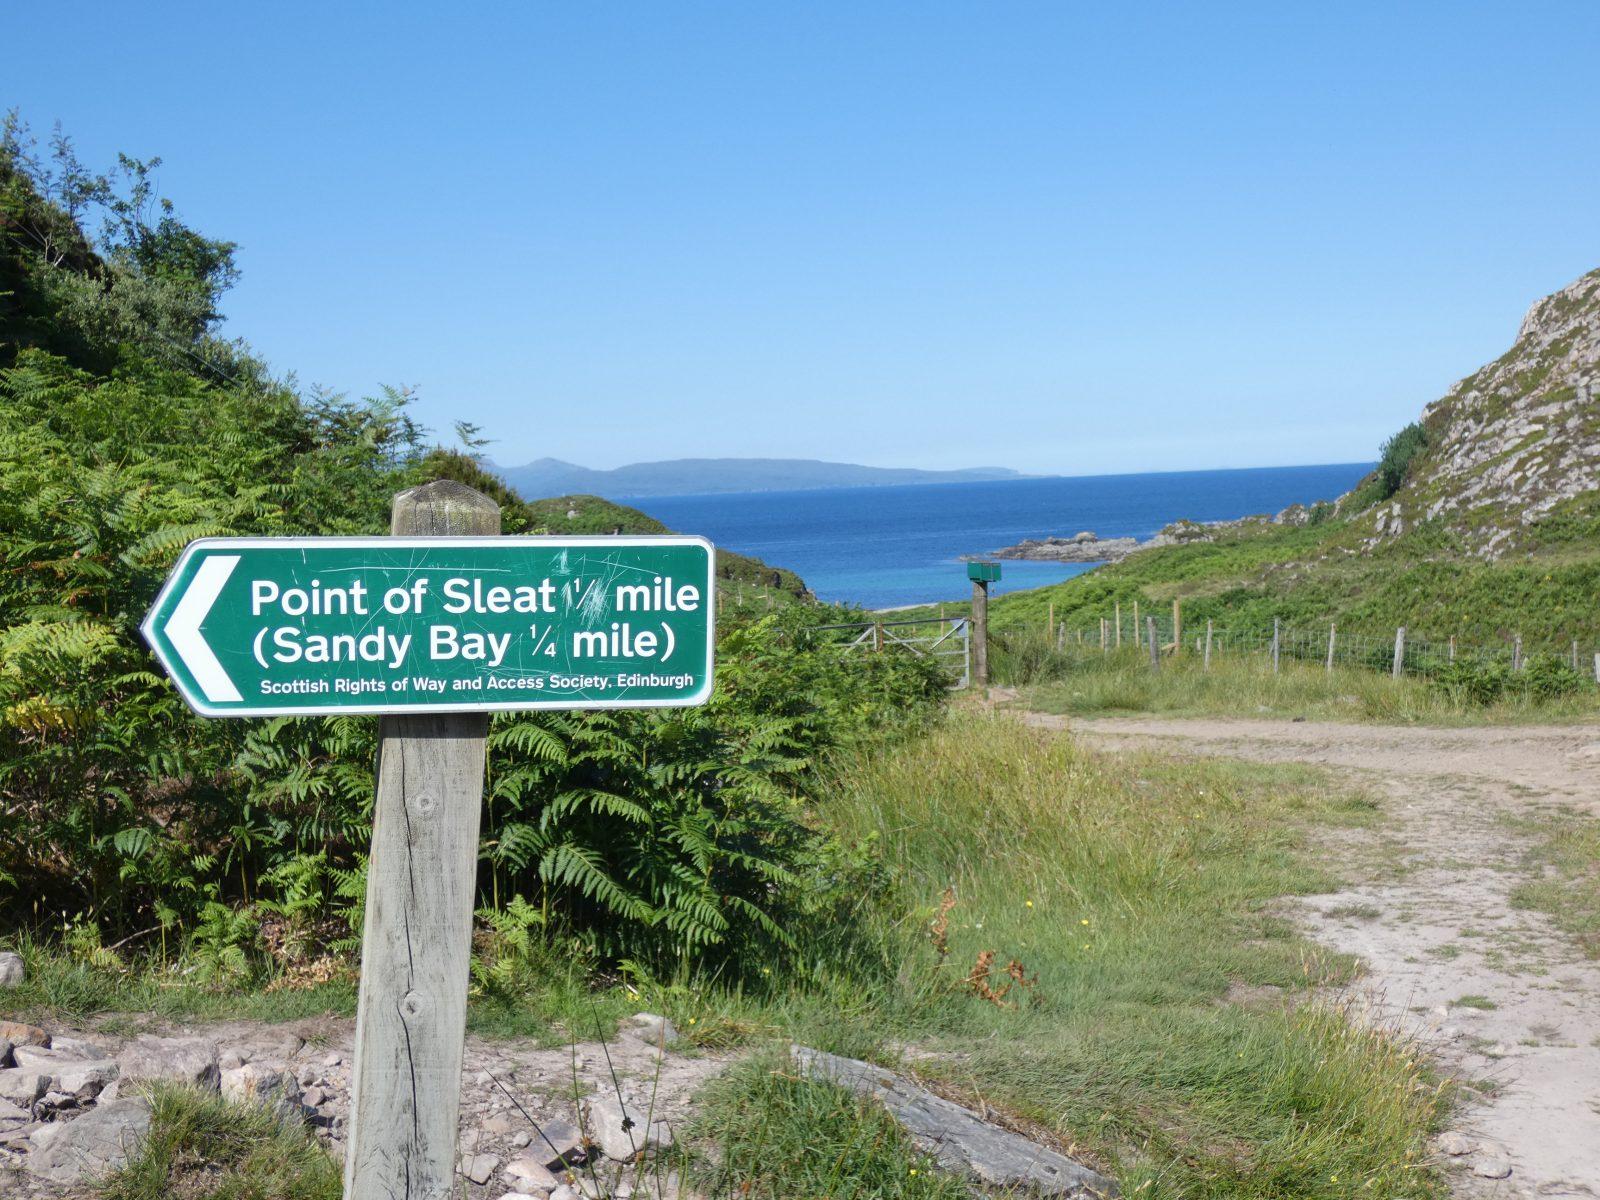 Abzweigung Port of Sleat